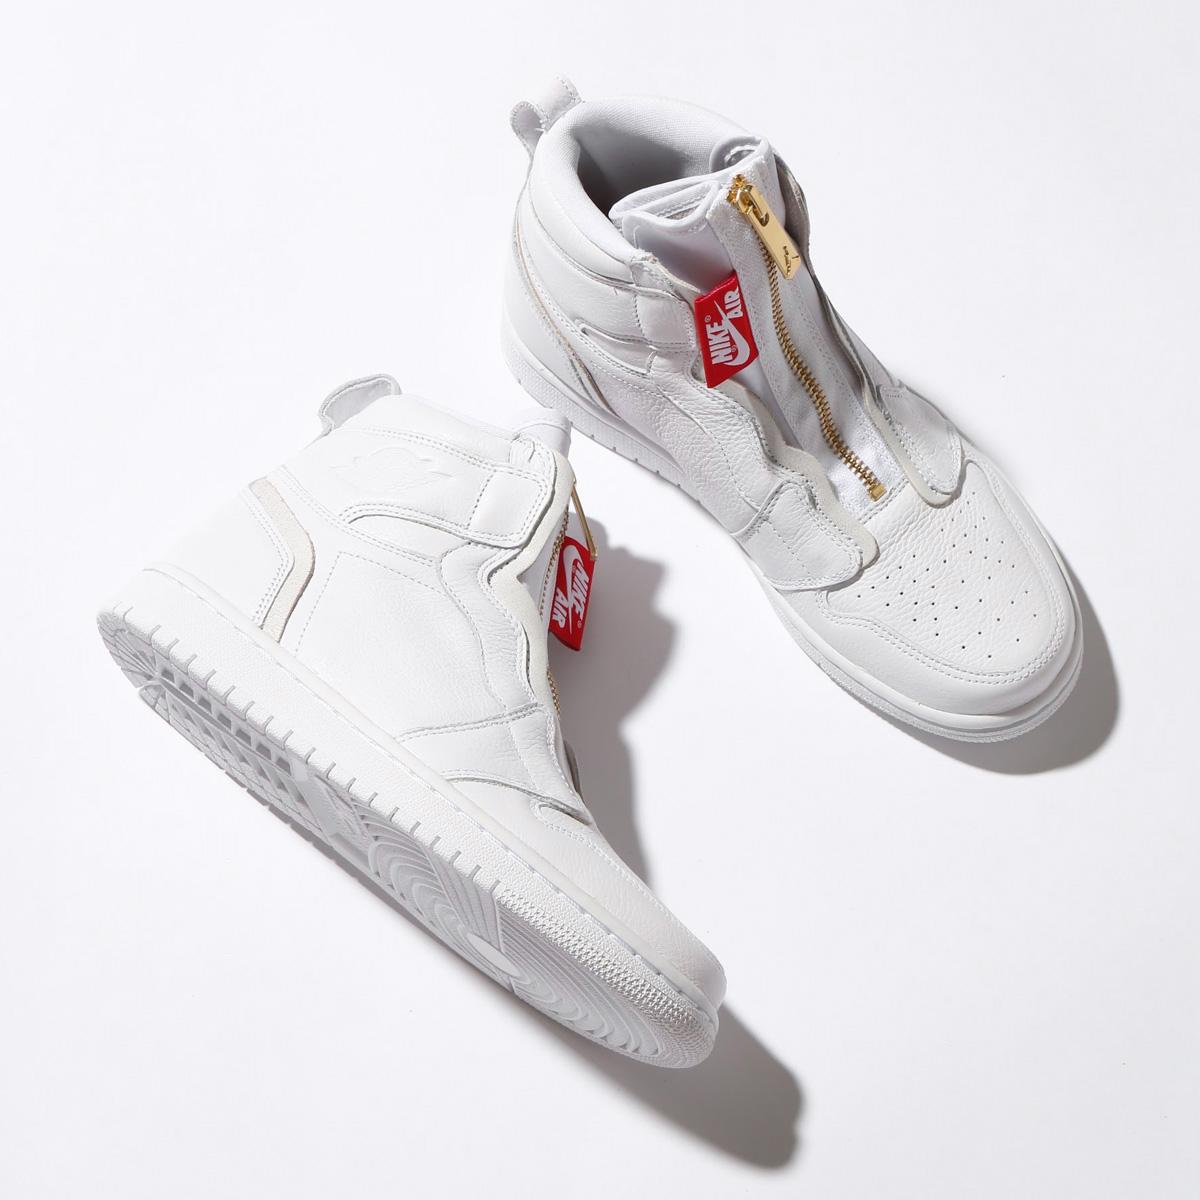 low cost dd9d4 f2e7a NIKE WMNS AIR JORDAN 1 HIGH ZIP (Nike women Air Jordan 1 high zip)  (WHITE WHITE-UNIVERSITY RED) 18SP-S